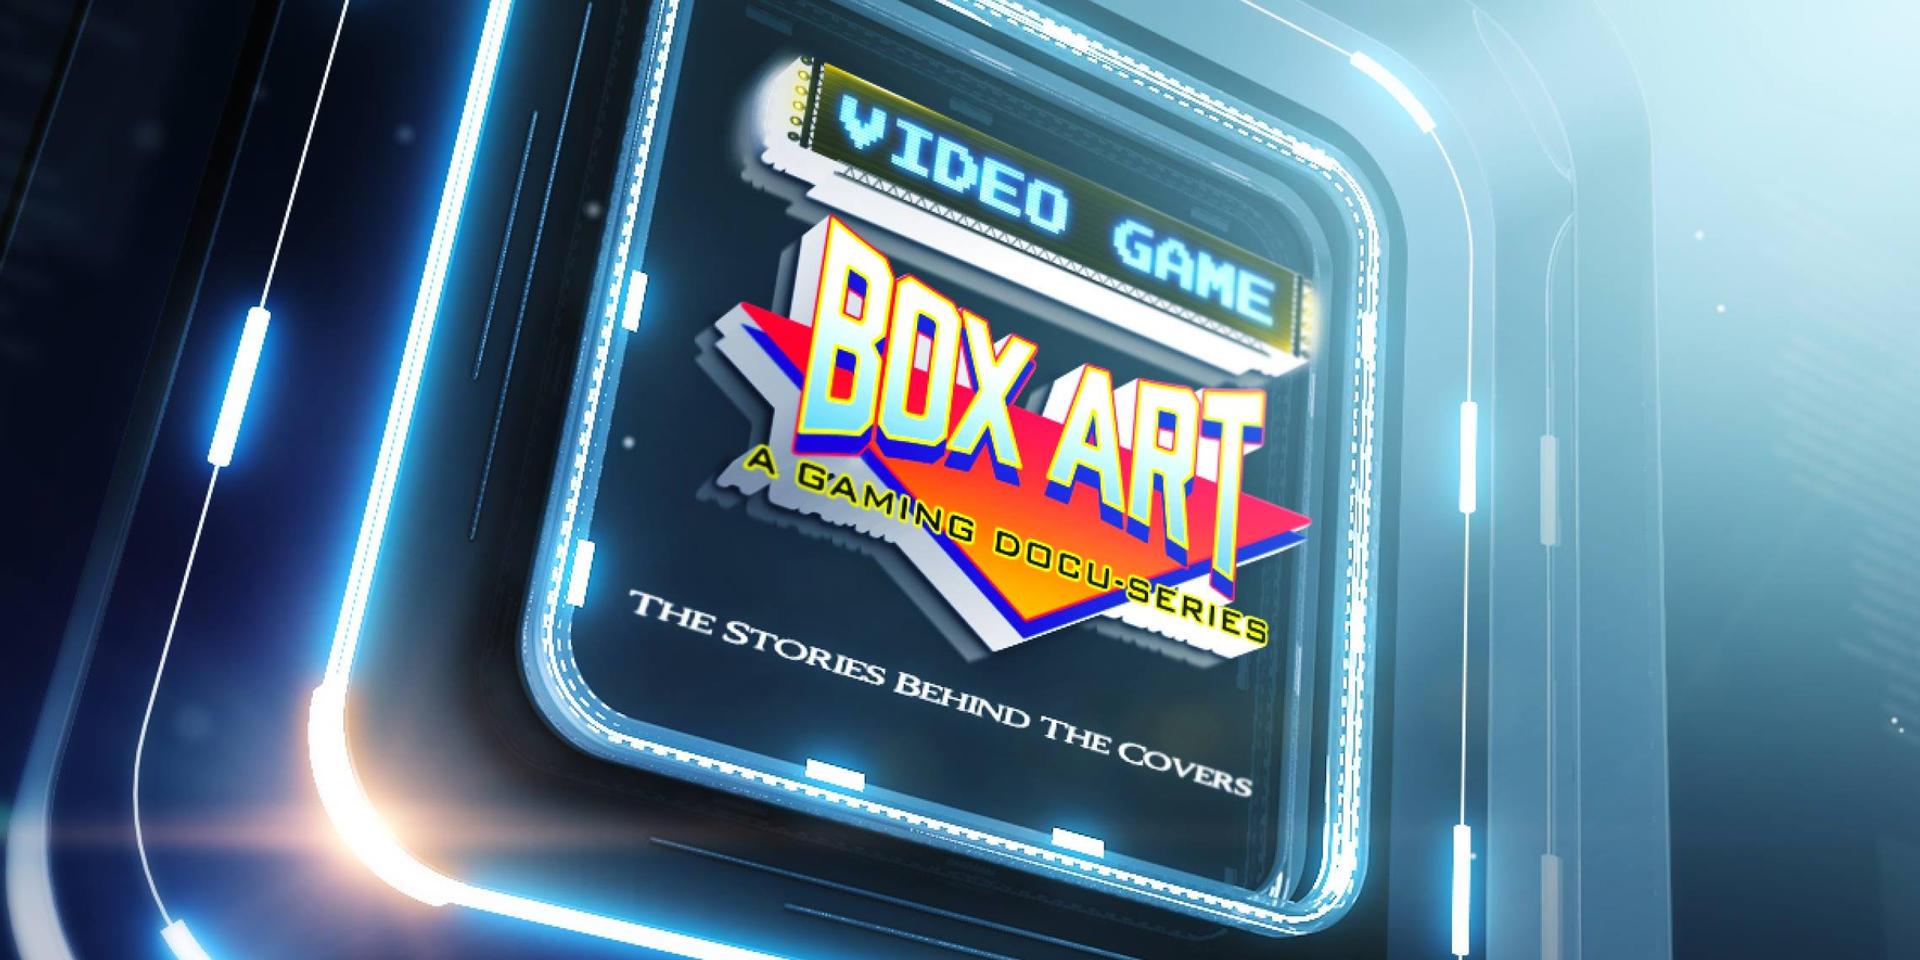 Box Art - A Gaming Documentary by Rob McCallum (USA)